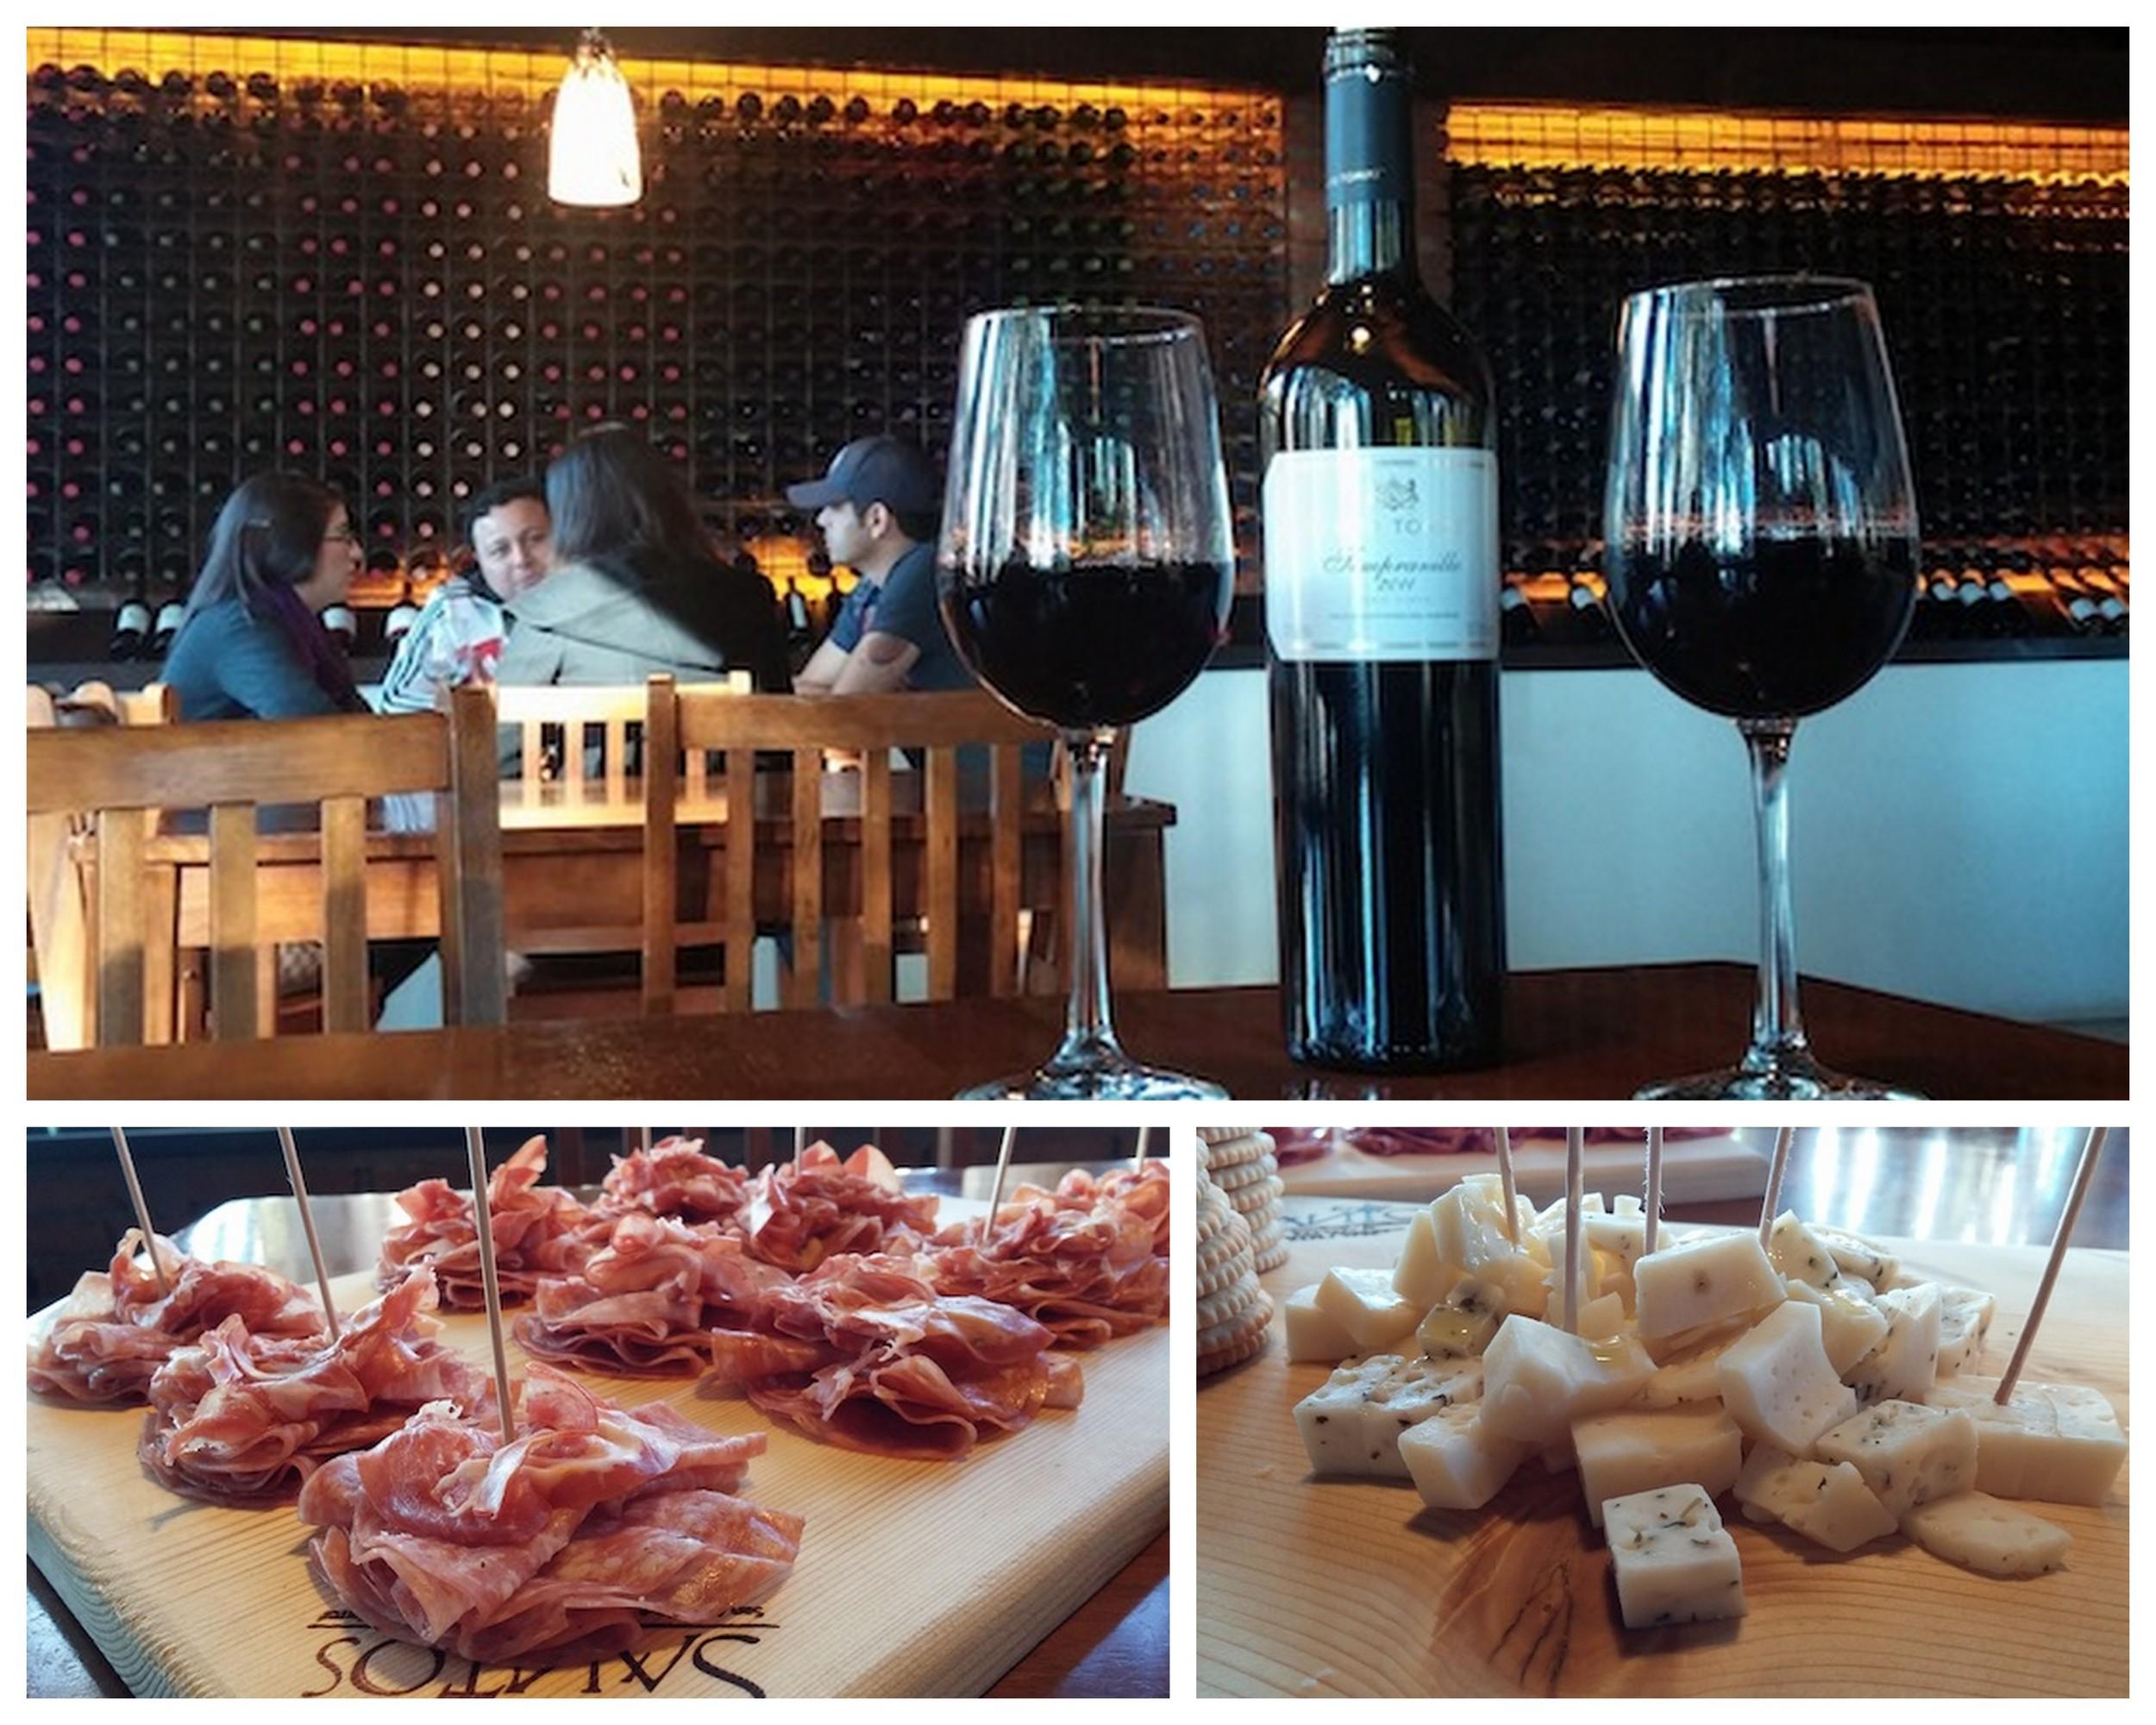 Tasting Room at Bodegas Santo Tomas #ensenada #mexico #wine